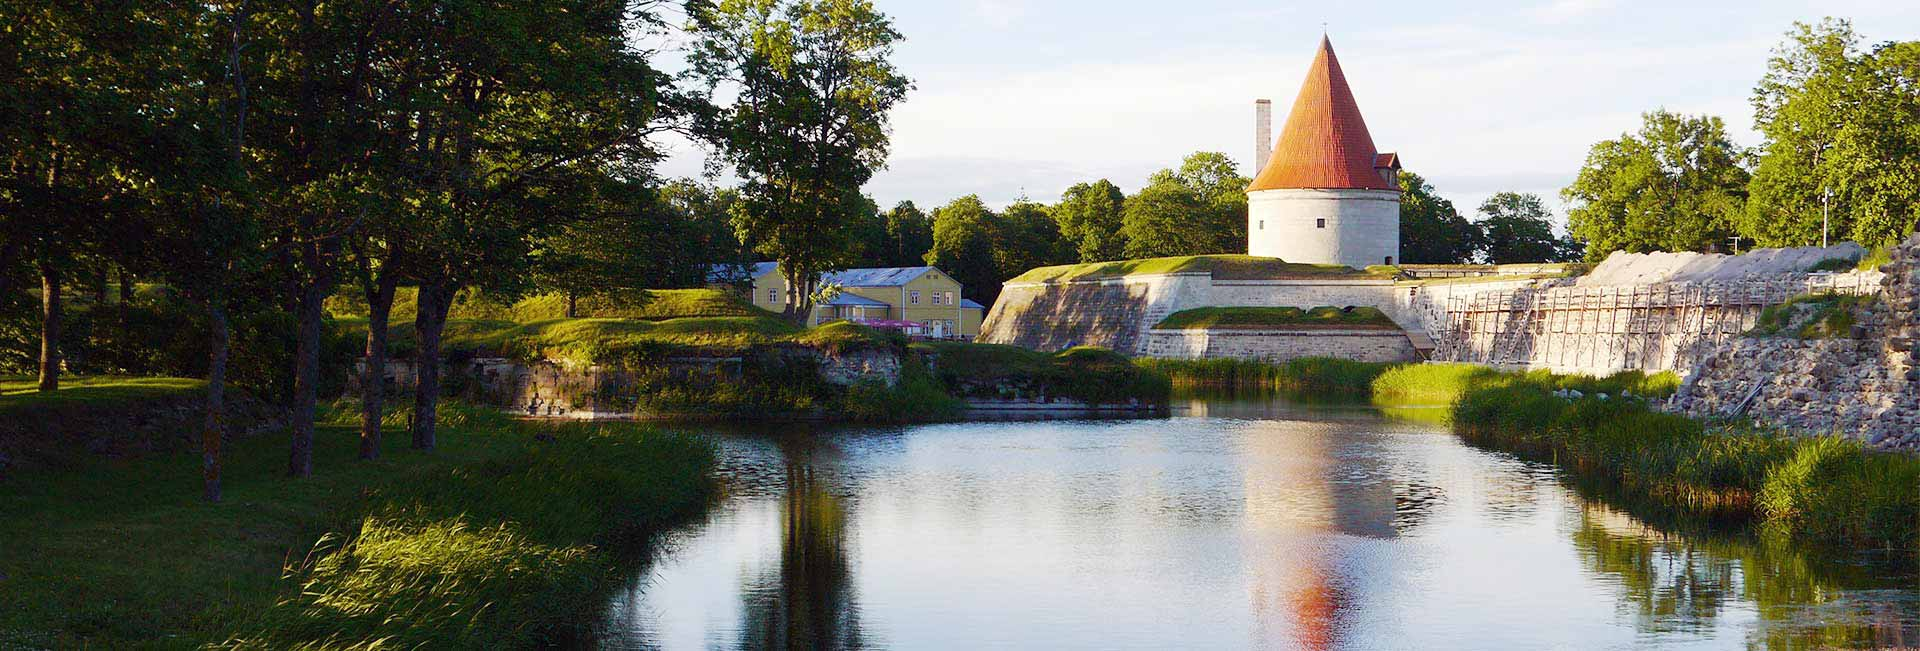 Kuressare fortress on Saaremaa island, in western Estonia. Photo credit: Martin Klimenta